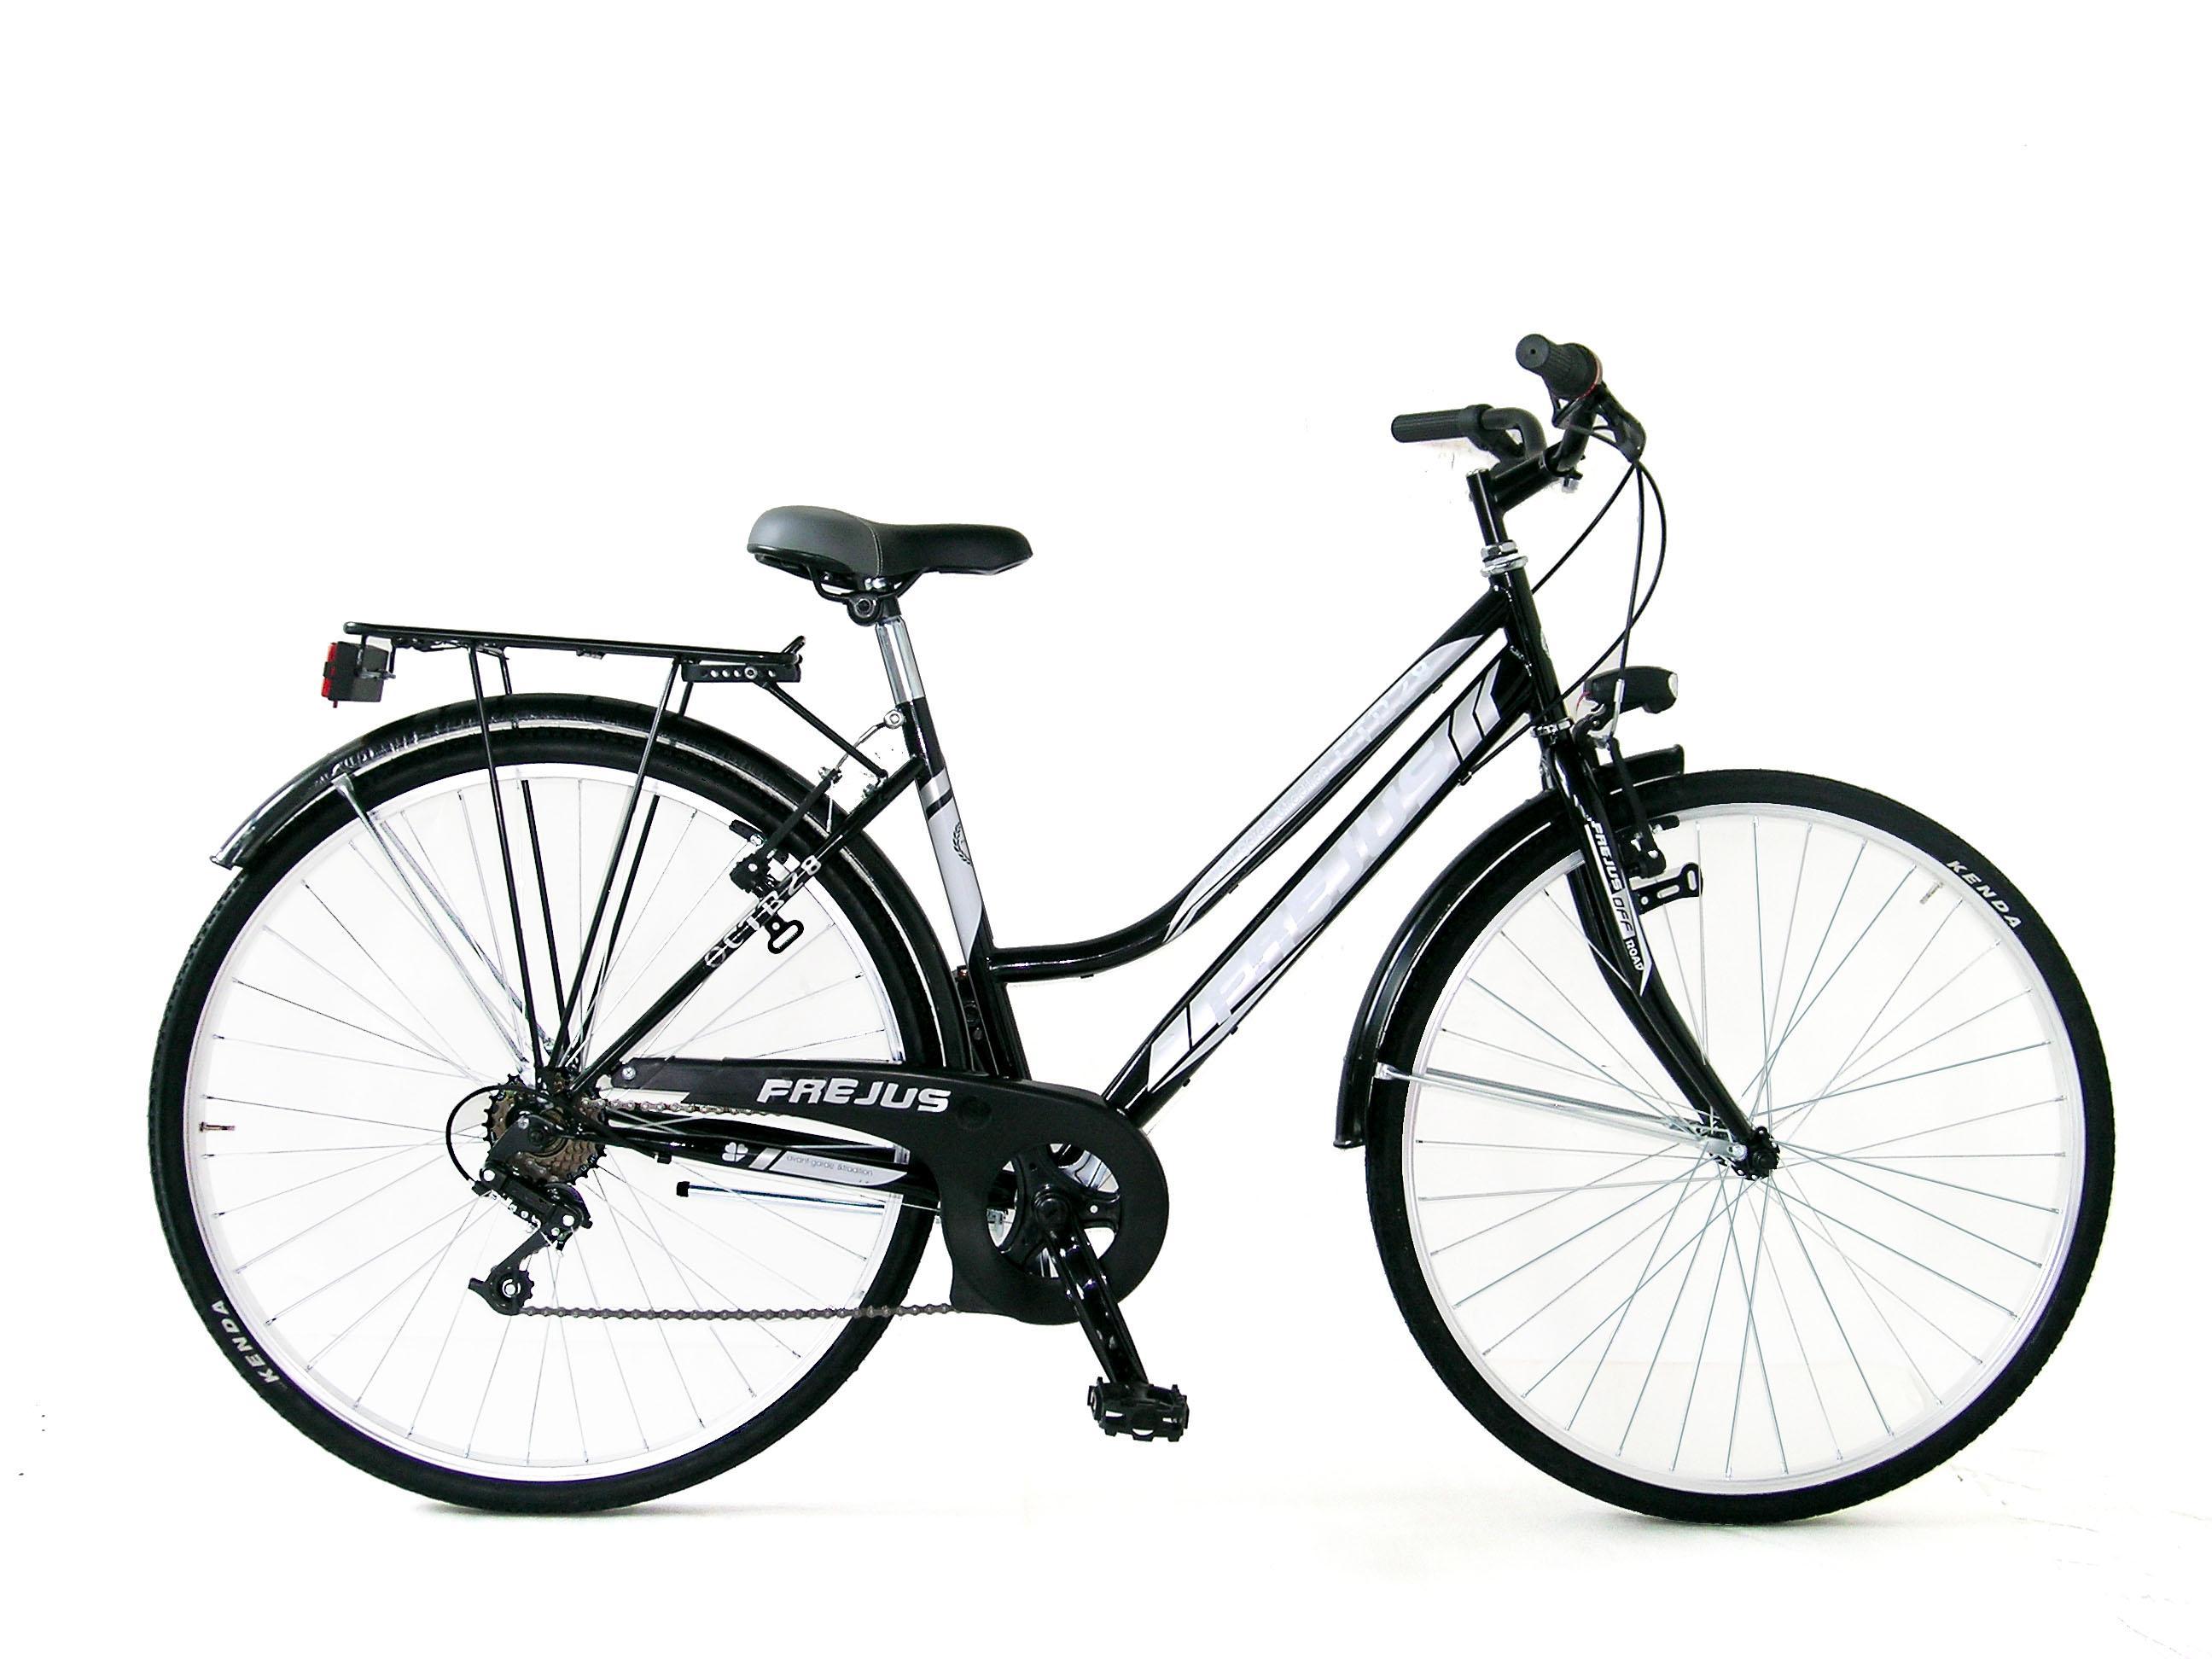 Frejus 28 Trekking Bicicletta Donna Nero